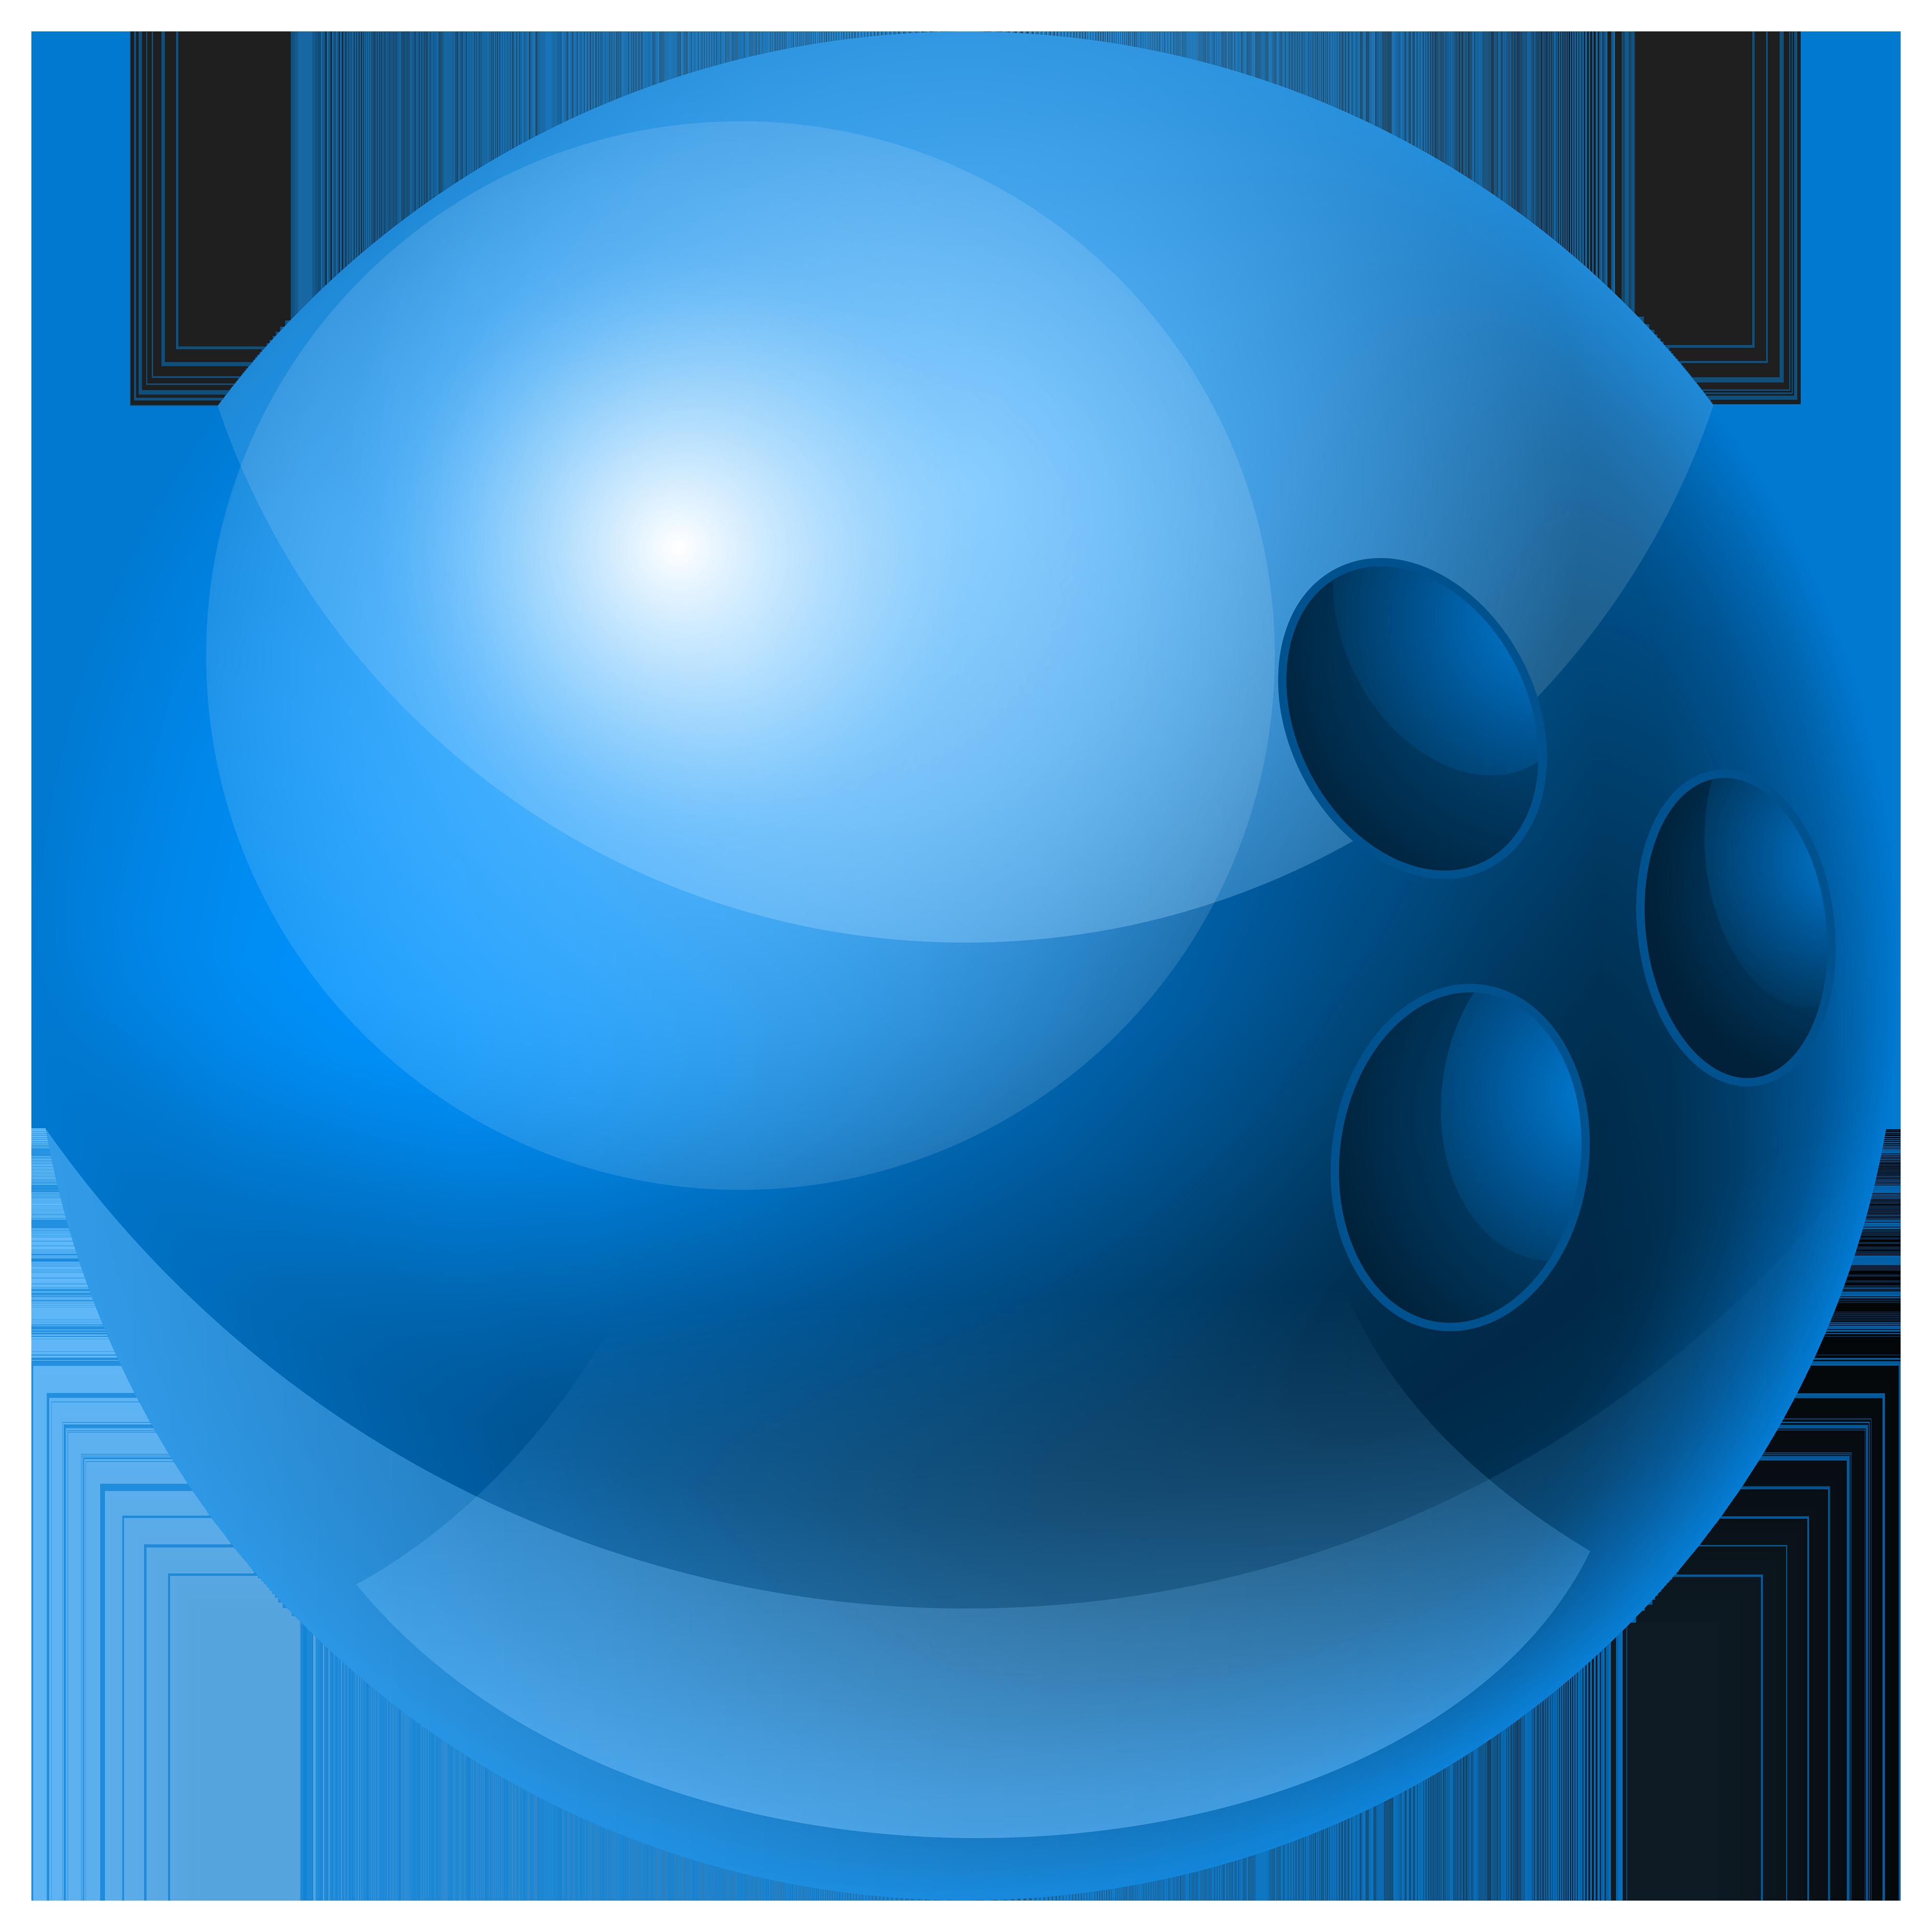 4000x4000 Blue Bowling Ball Png Clipart